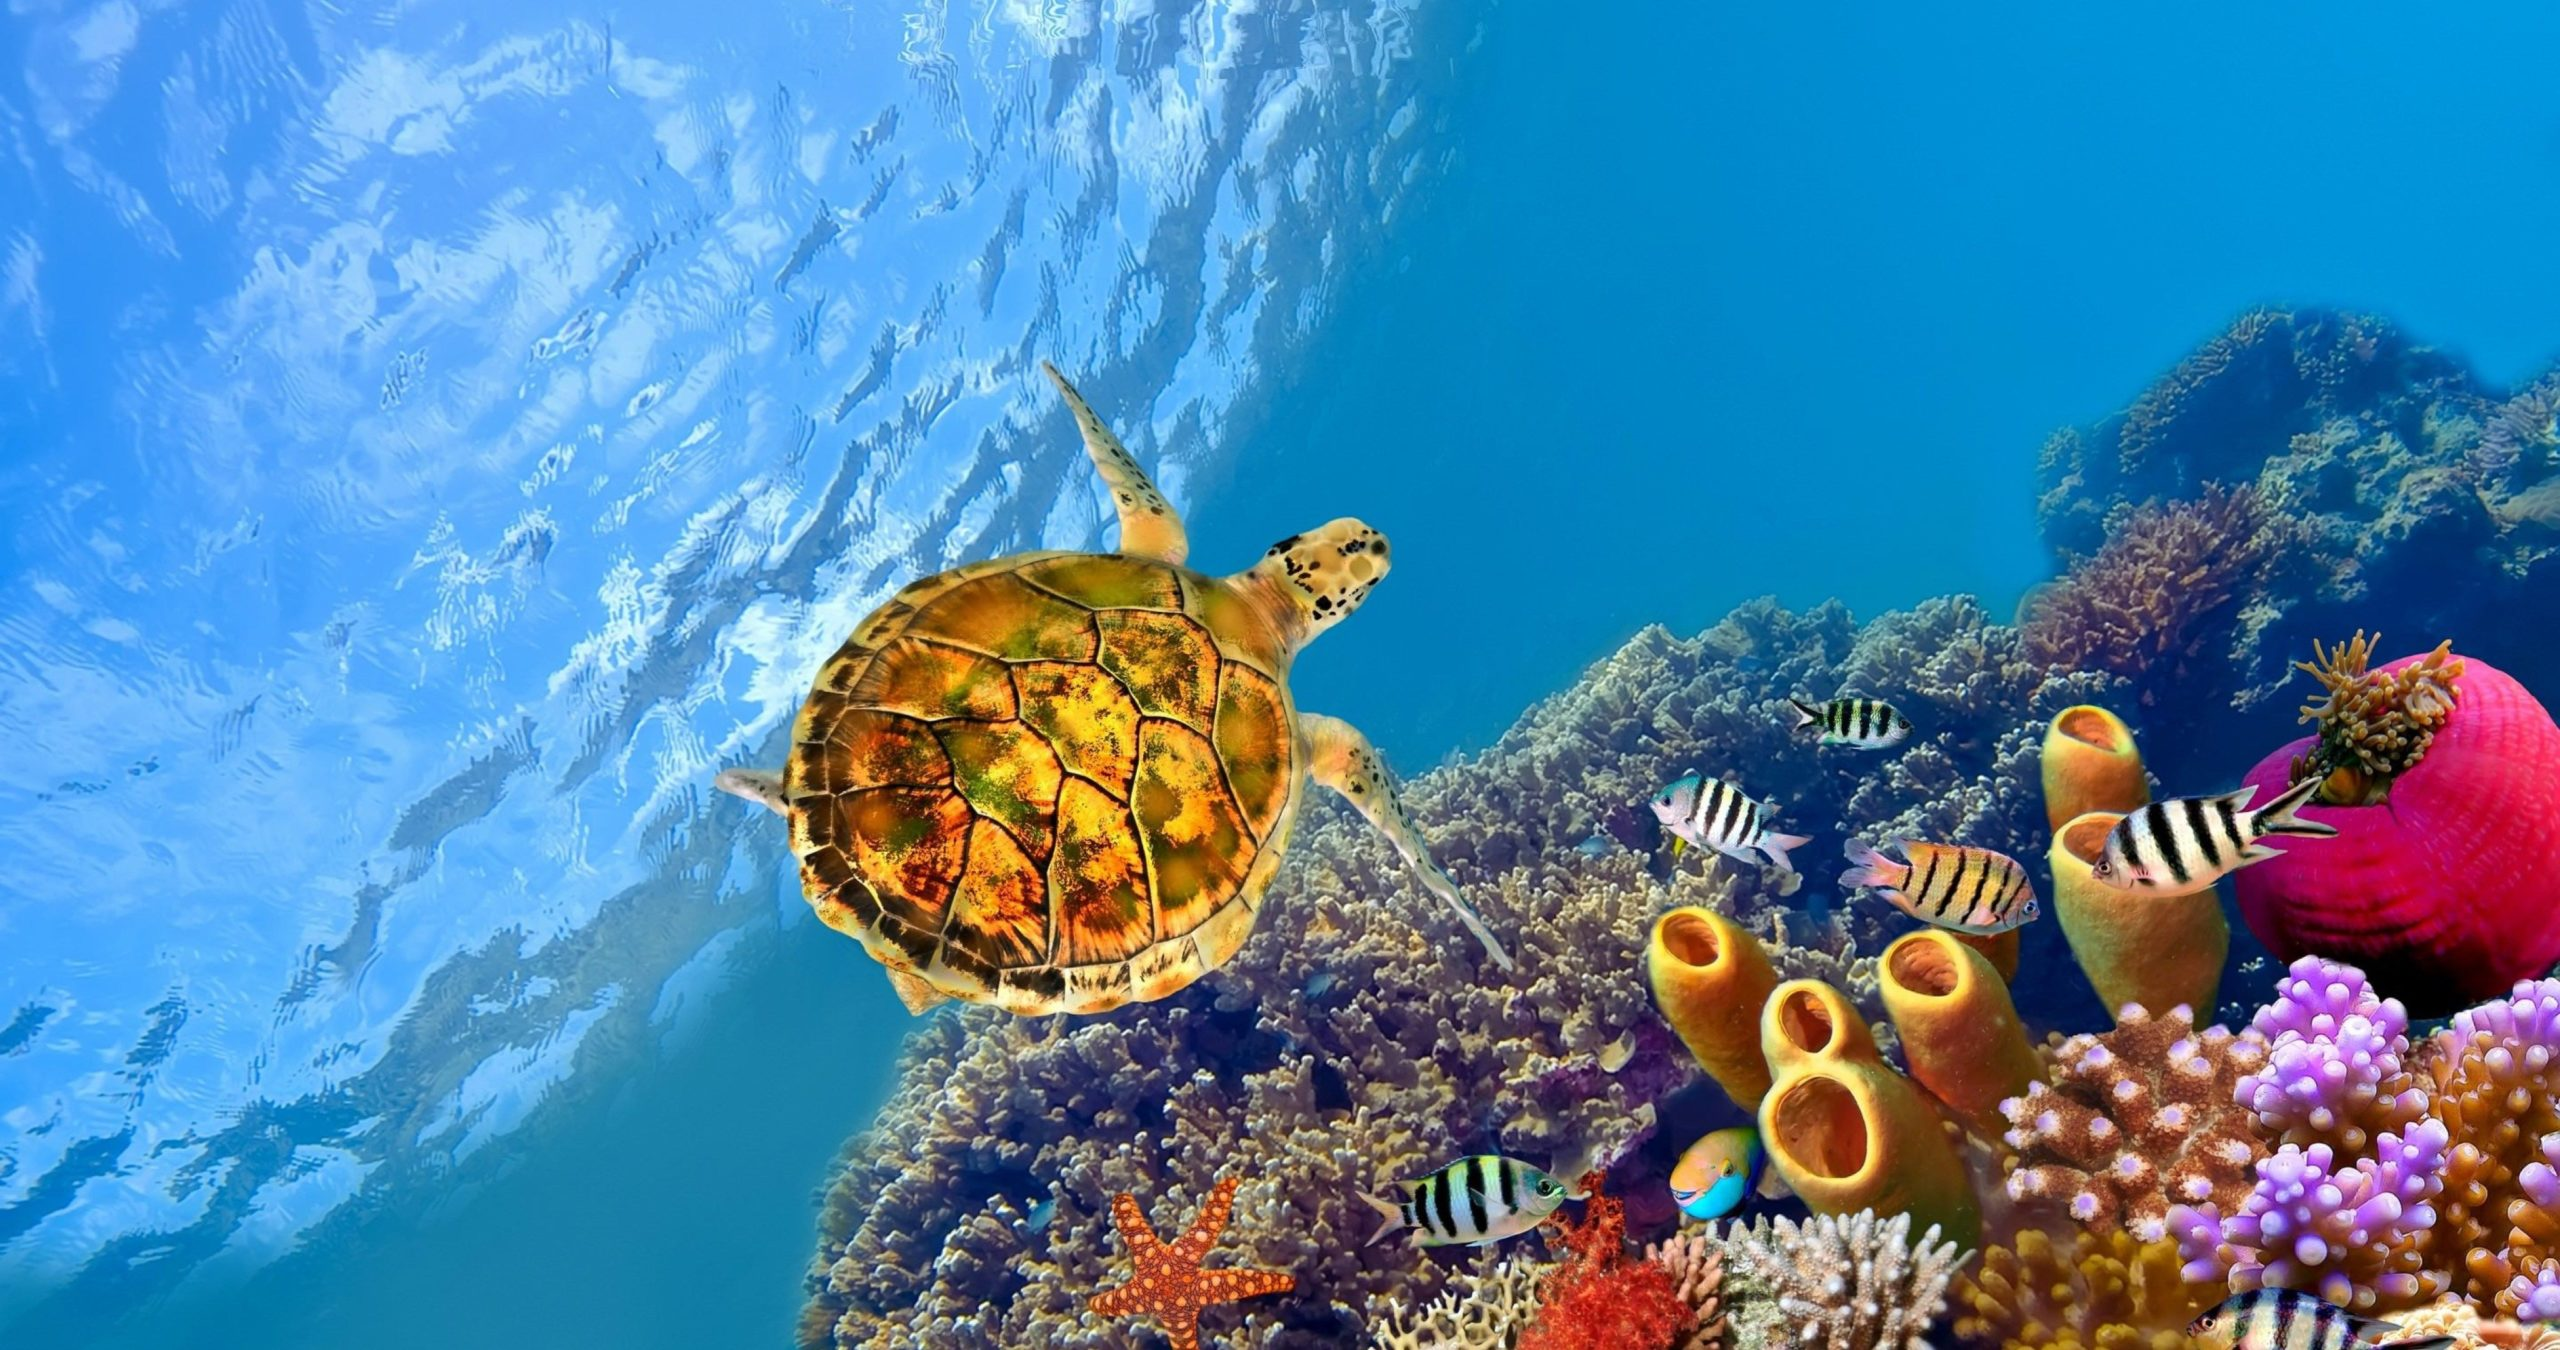 high resolution underwater images